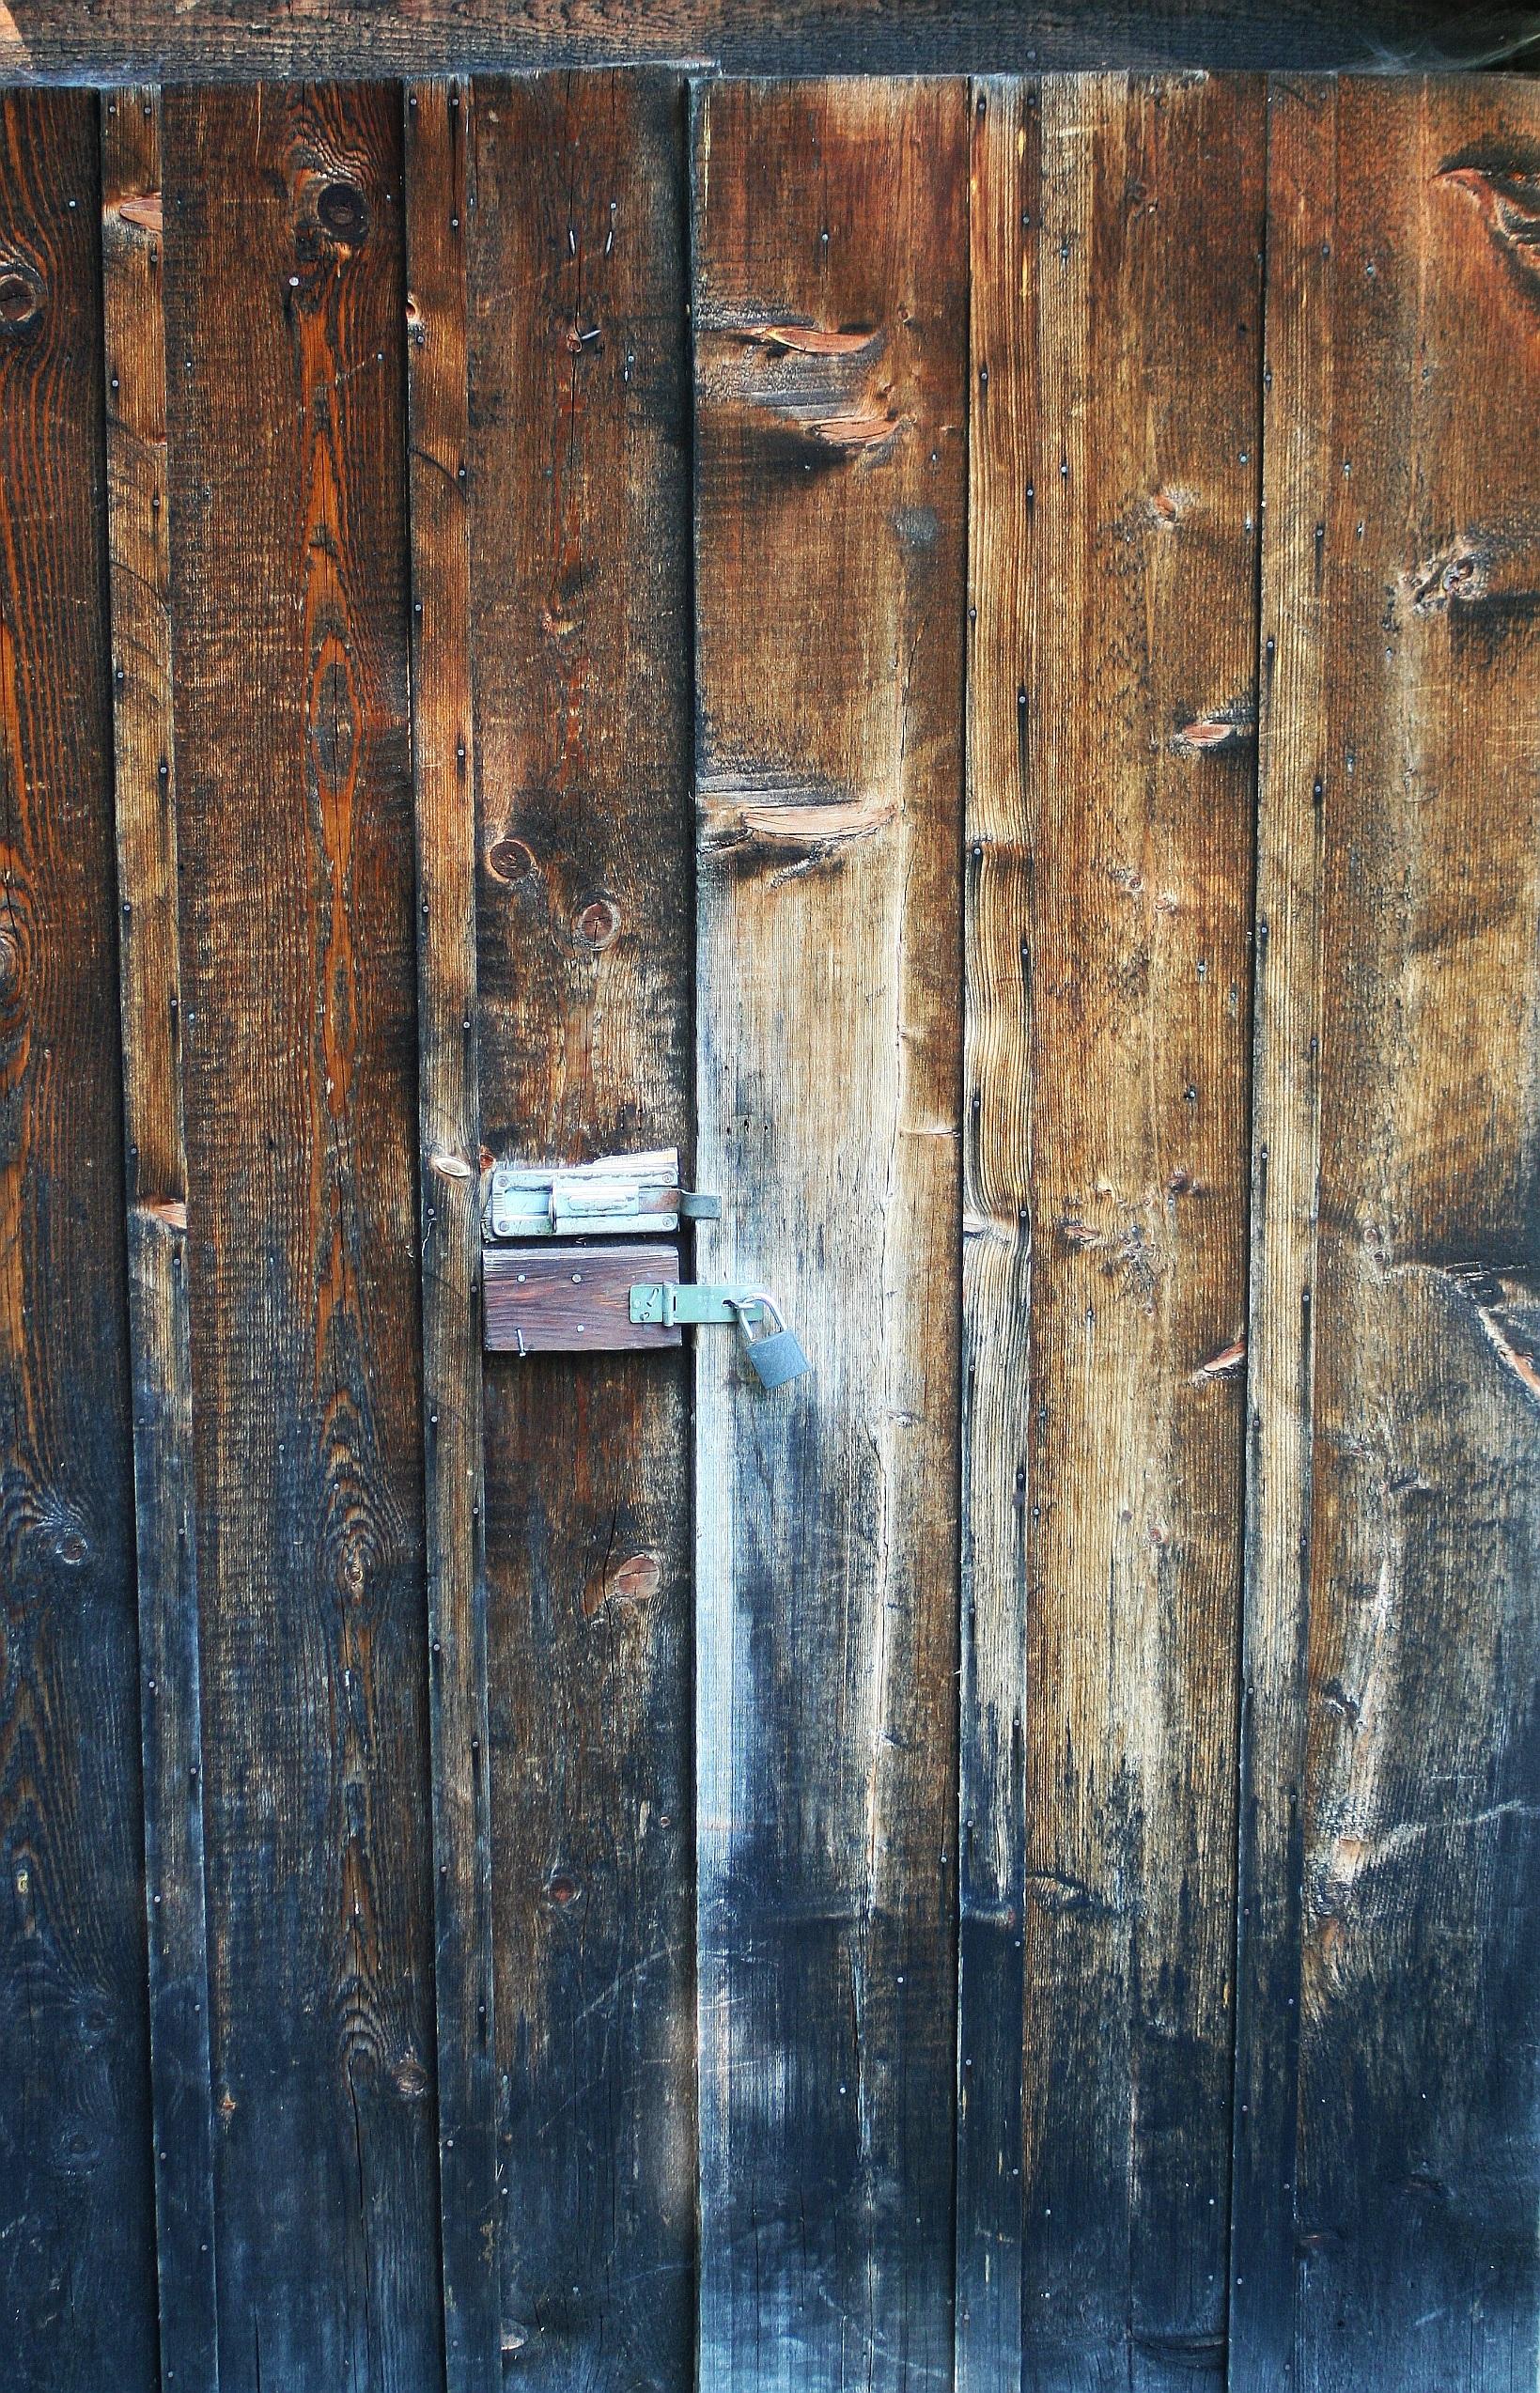 Fotos Gratis Textura Piso Antiguo Granero Pared Azul  # Muebles Water Antiguo